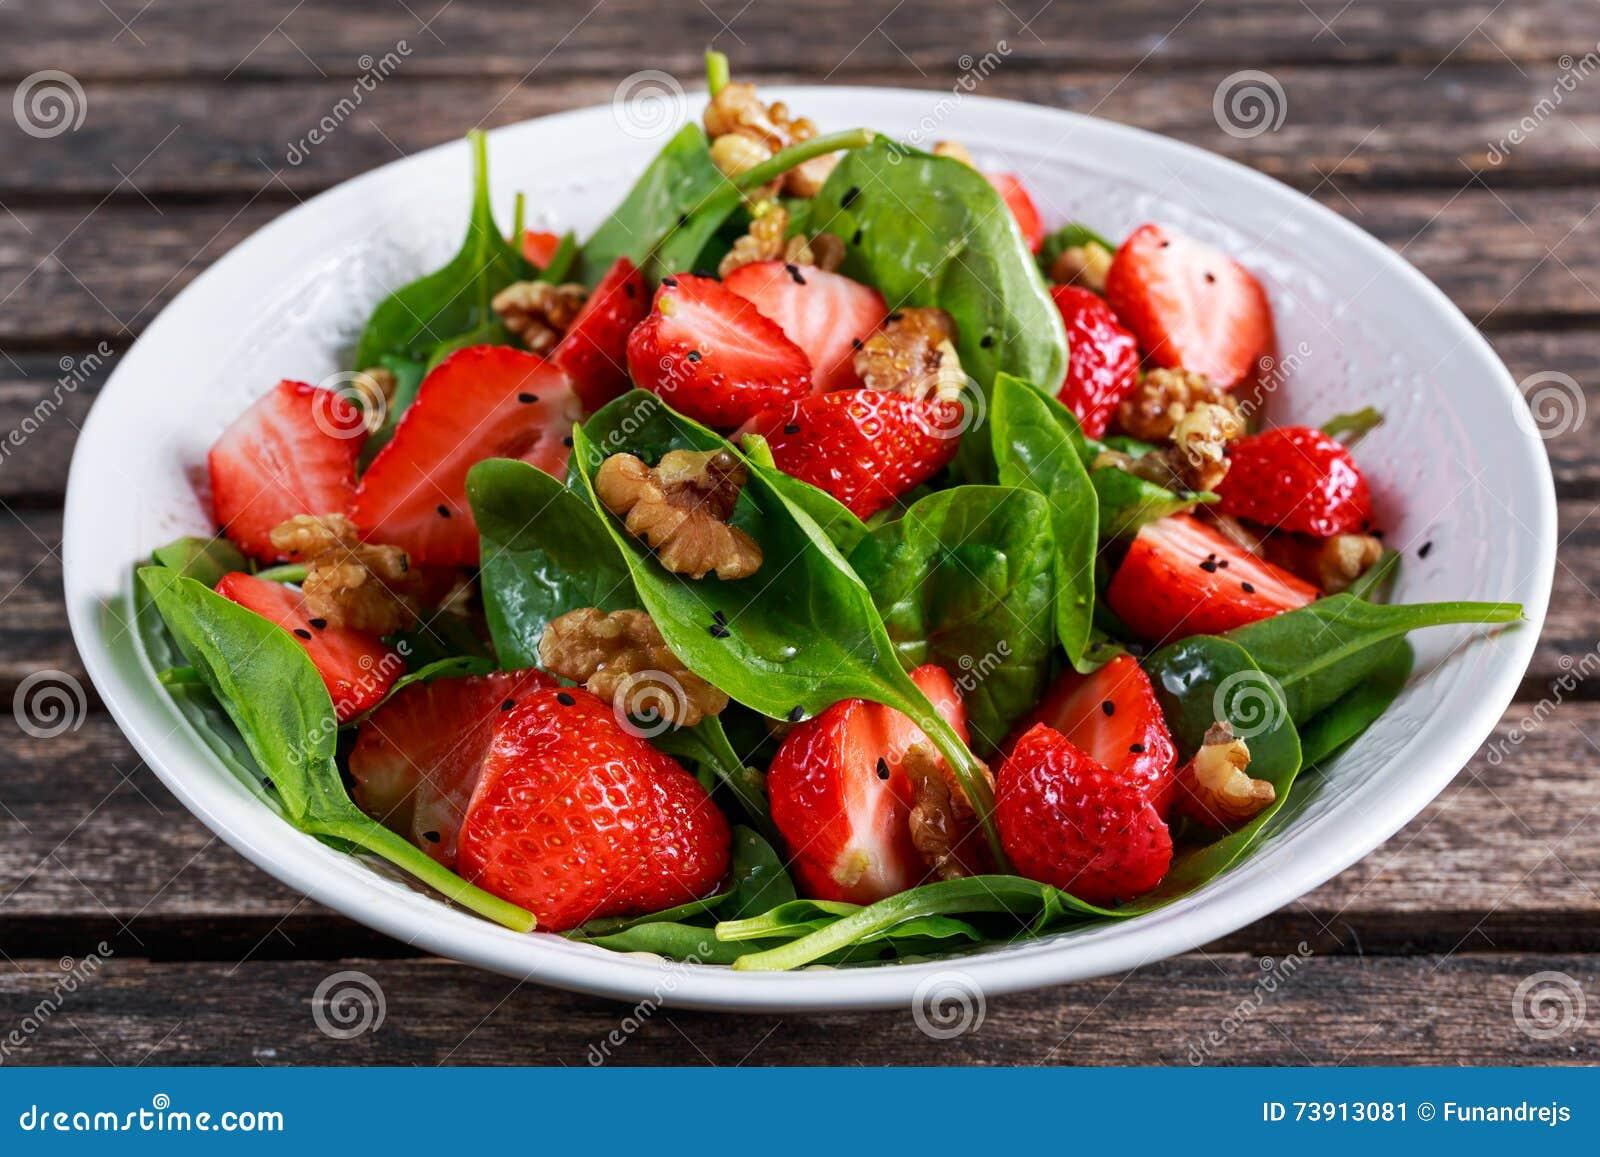 Spinats-Erdbeernüsse Salat des Sommer-Frucht-strengen Vegetariers Konzeptbiokost